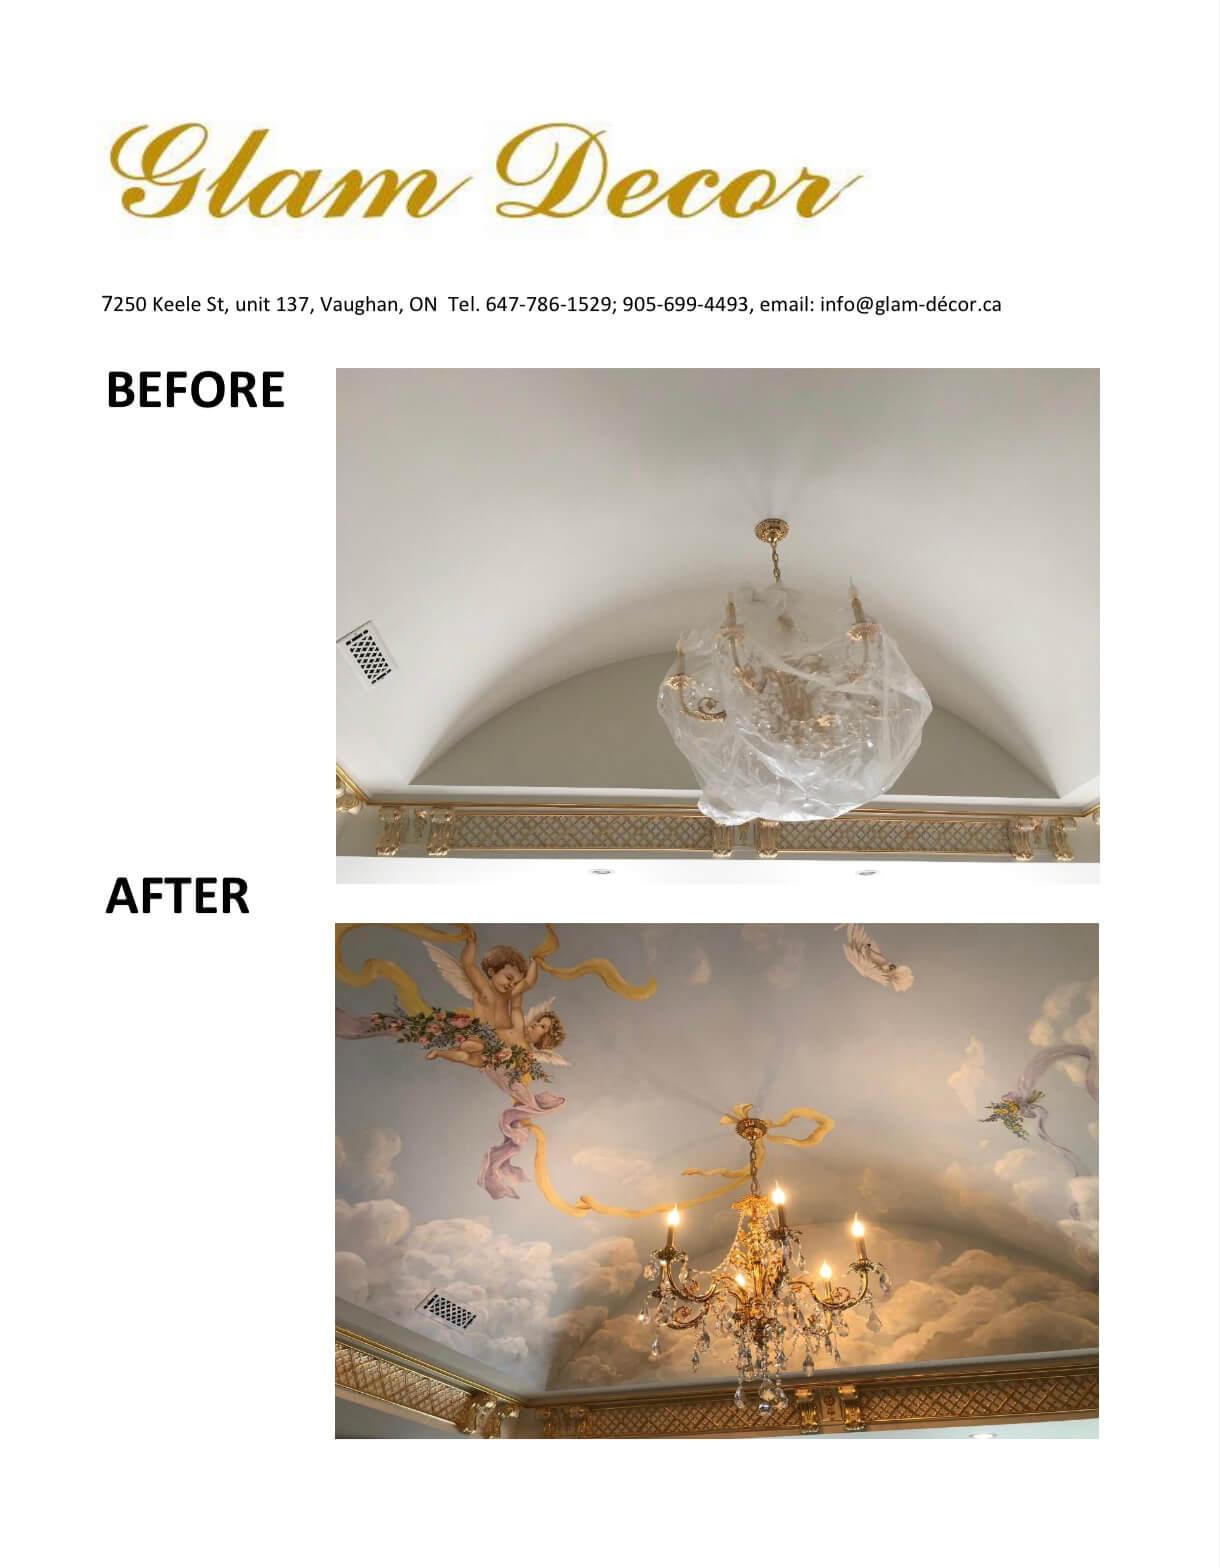 Glam Decor Improve Canada sparkleshinylove